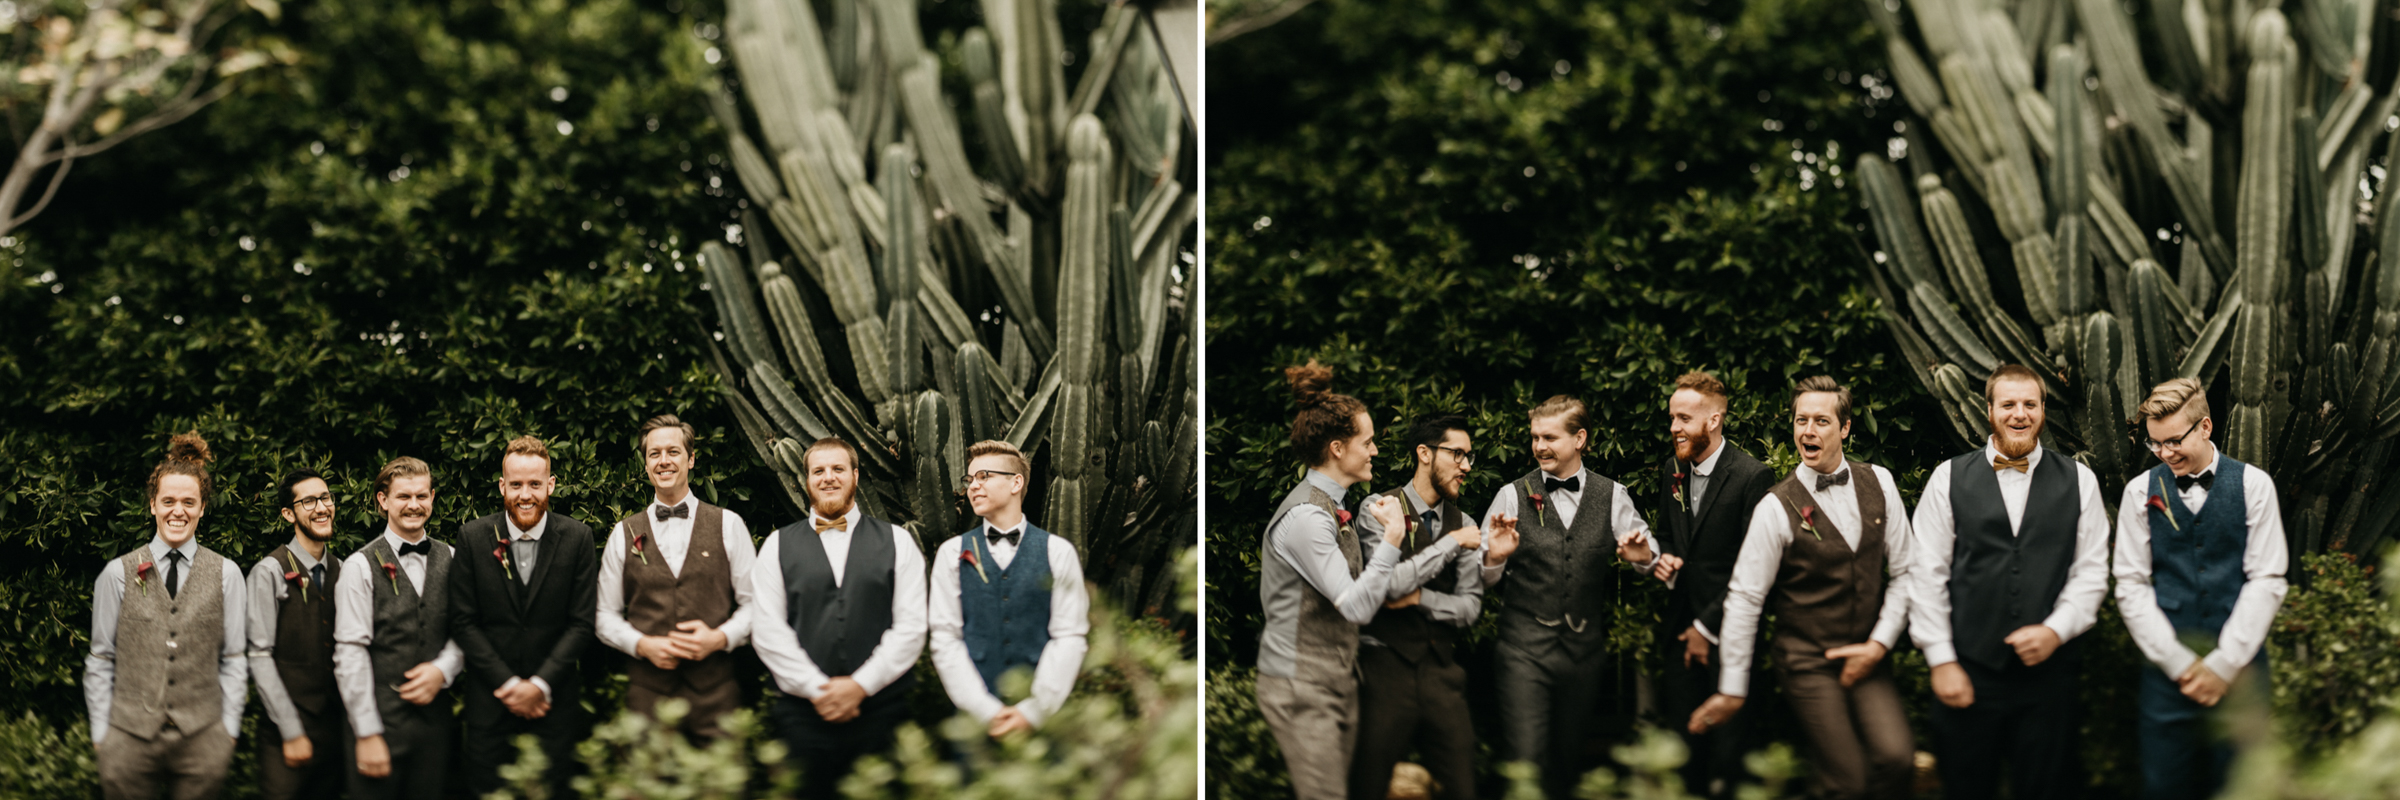 ©Isaiah + Taylor Photography - Studio 11 Wedding, Los Angeles Wedding Photographer-60.jpg